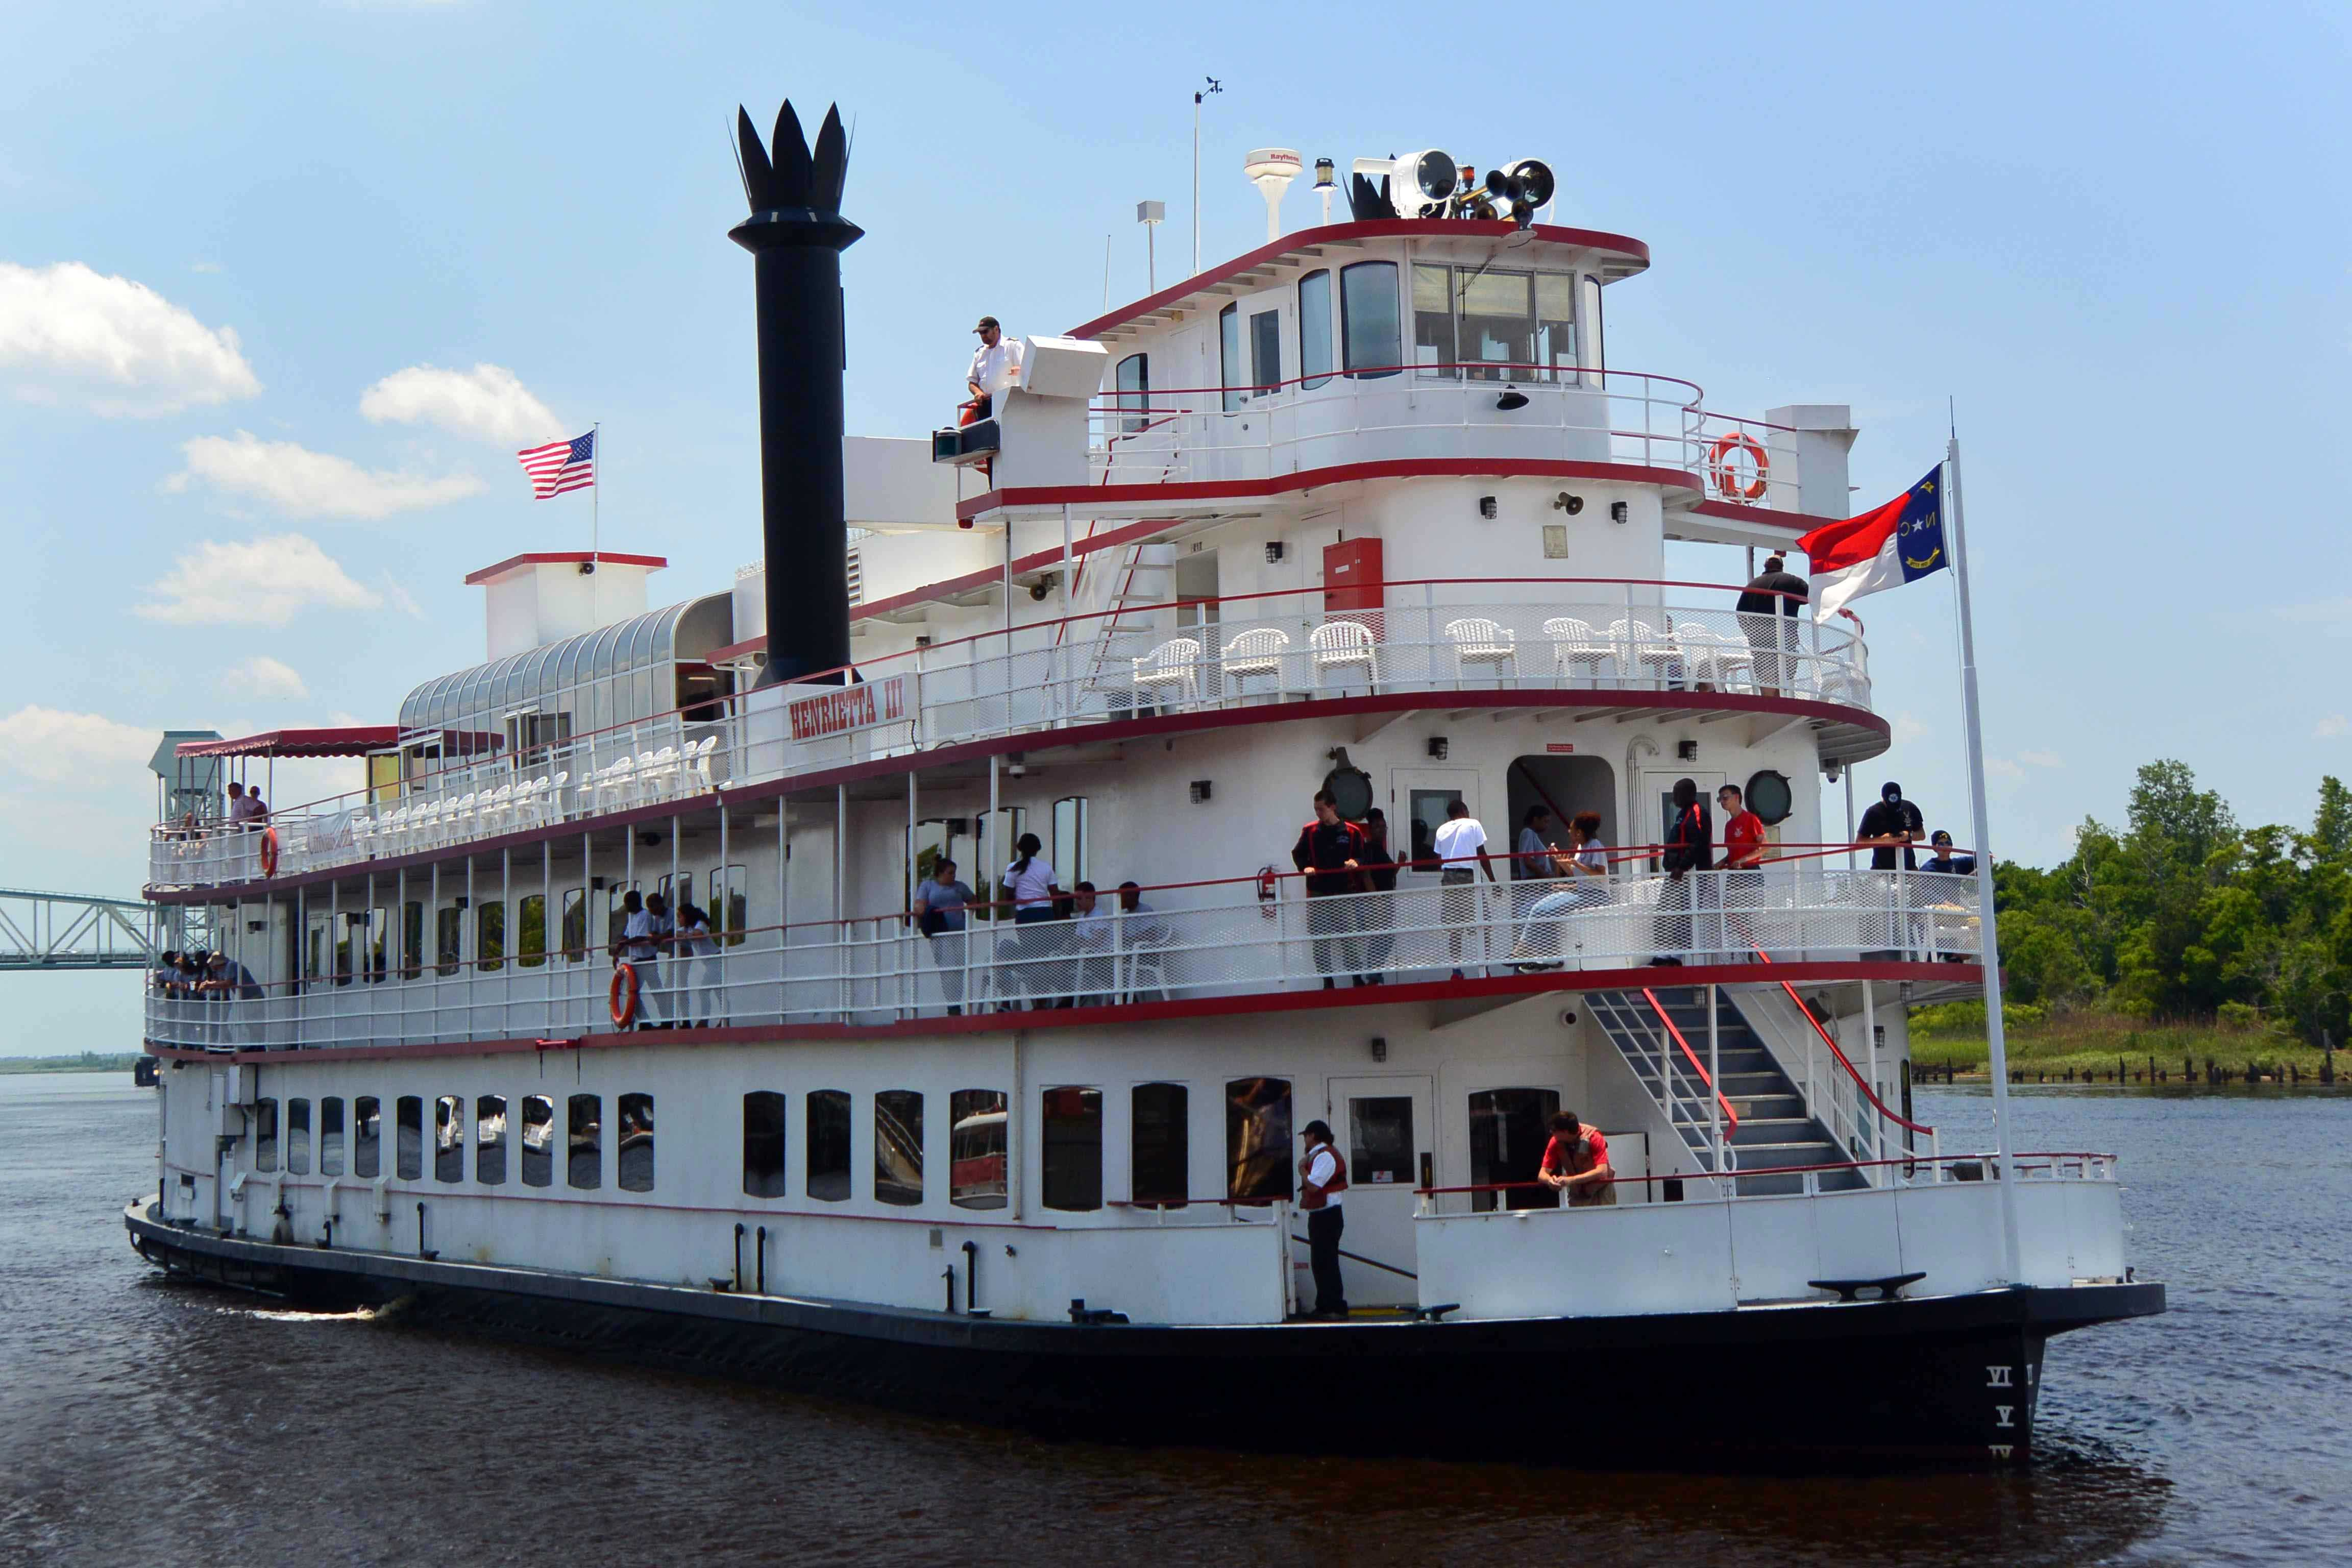 Riverboat In Wilmington By Sara Kendall Jpg 4608 3072 Hudson River Cruises River Cruises Cruise